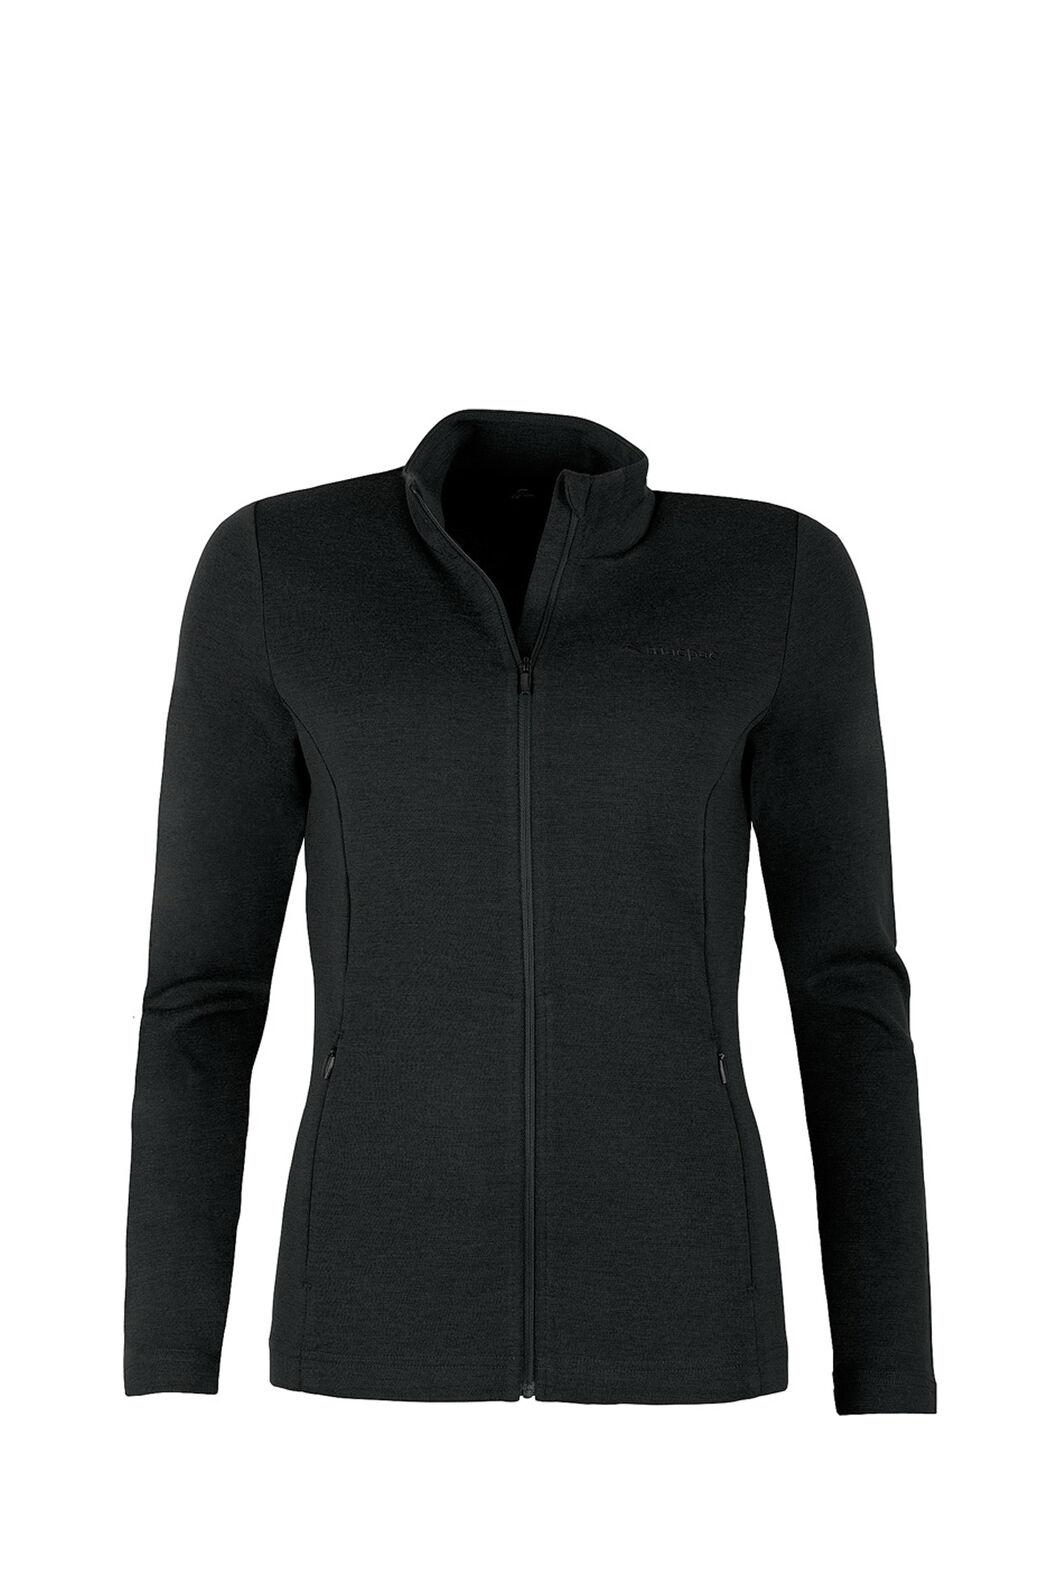 Macpac Brunner 390 Merino Jacket - Women's, Black, hi-res